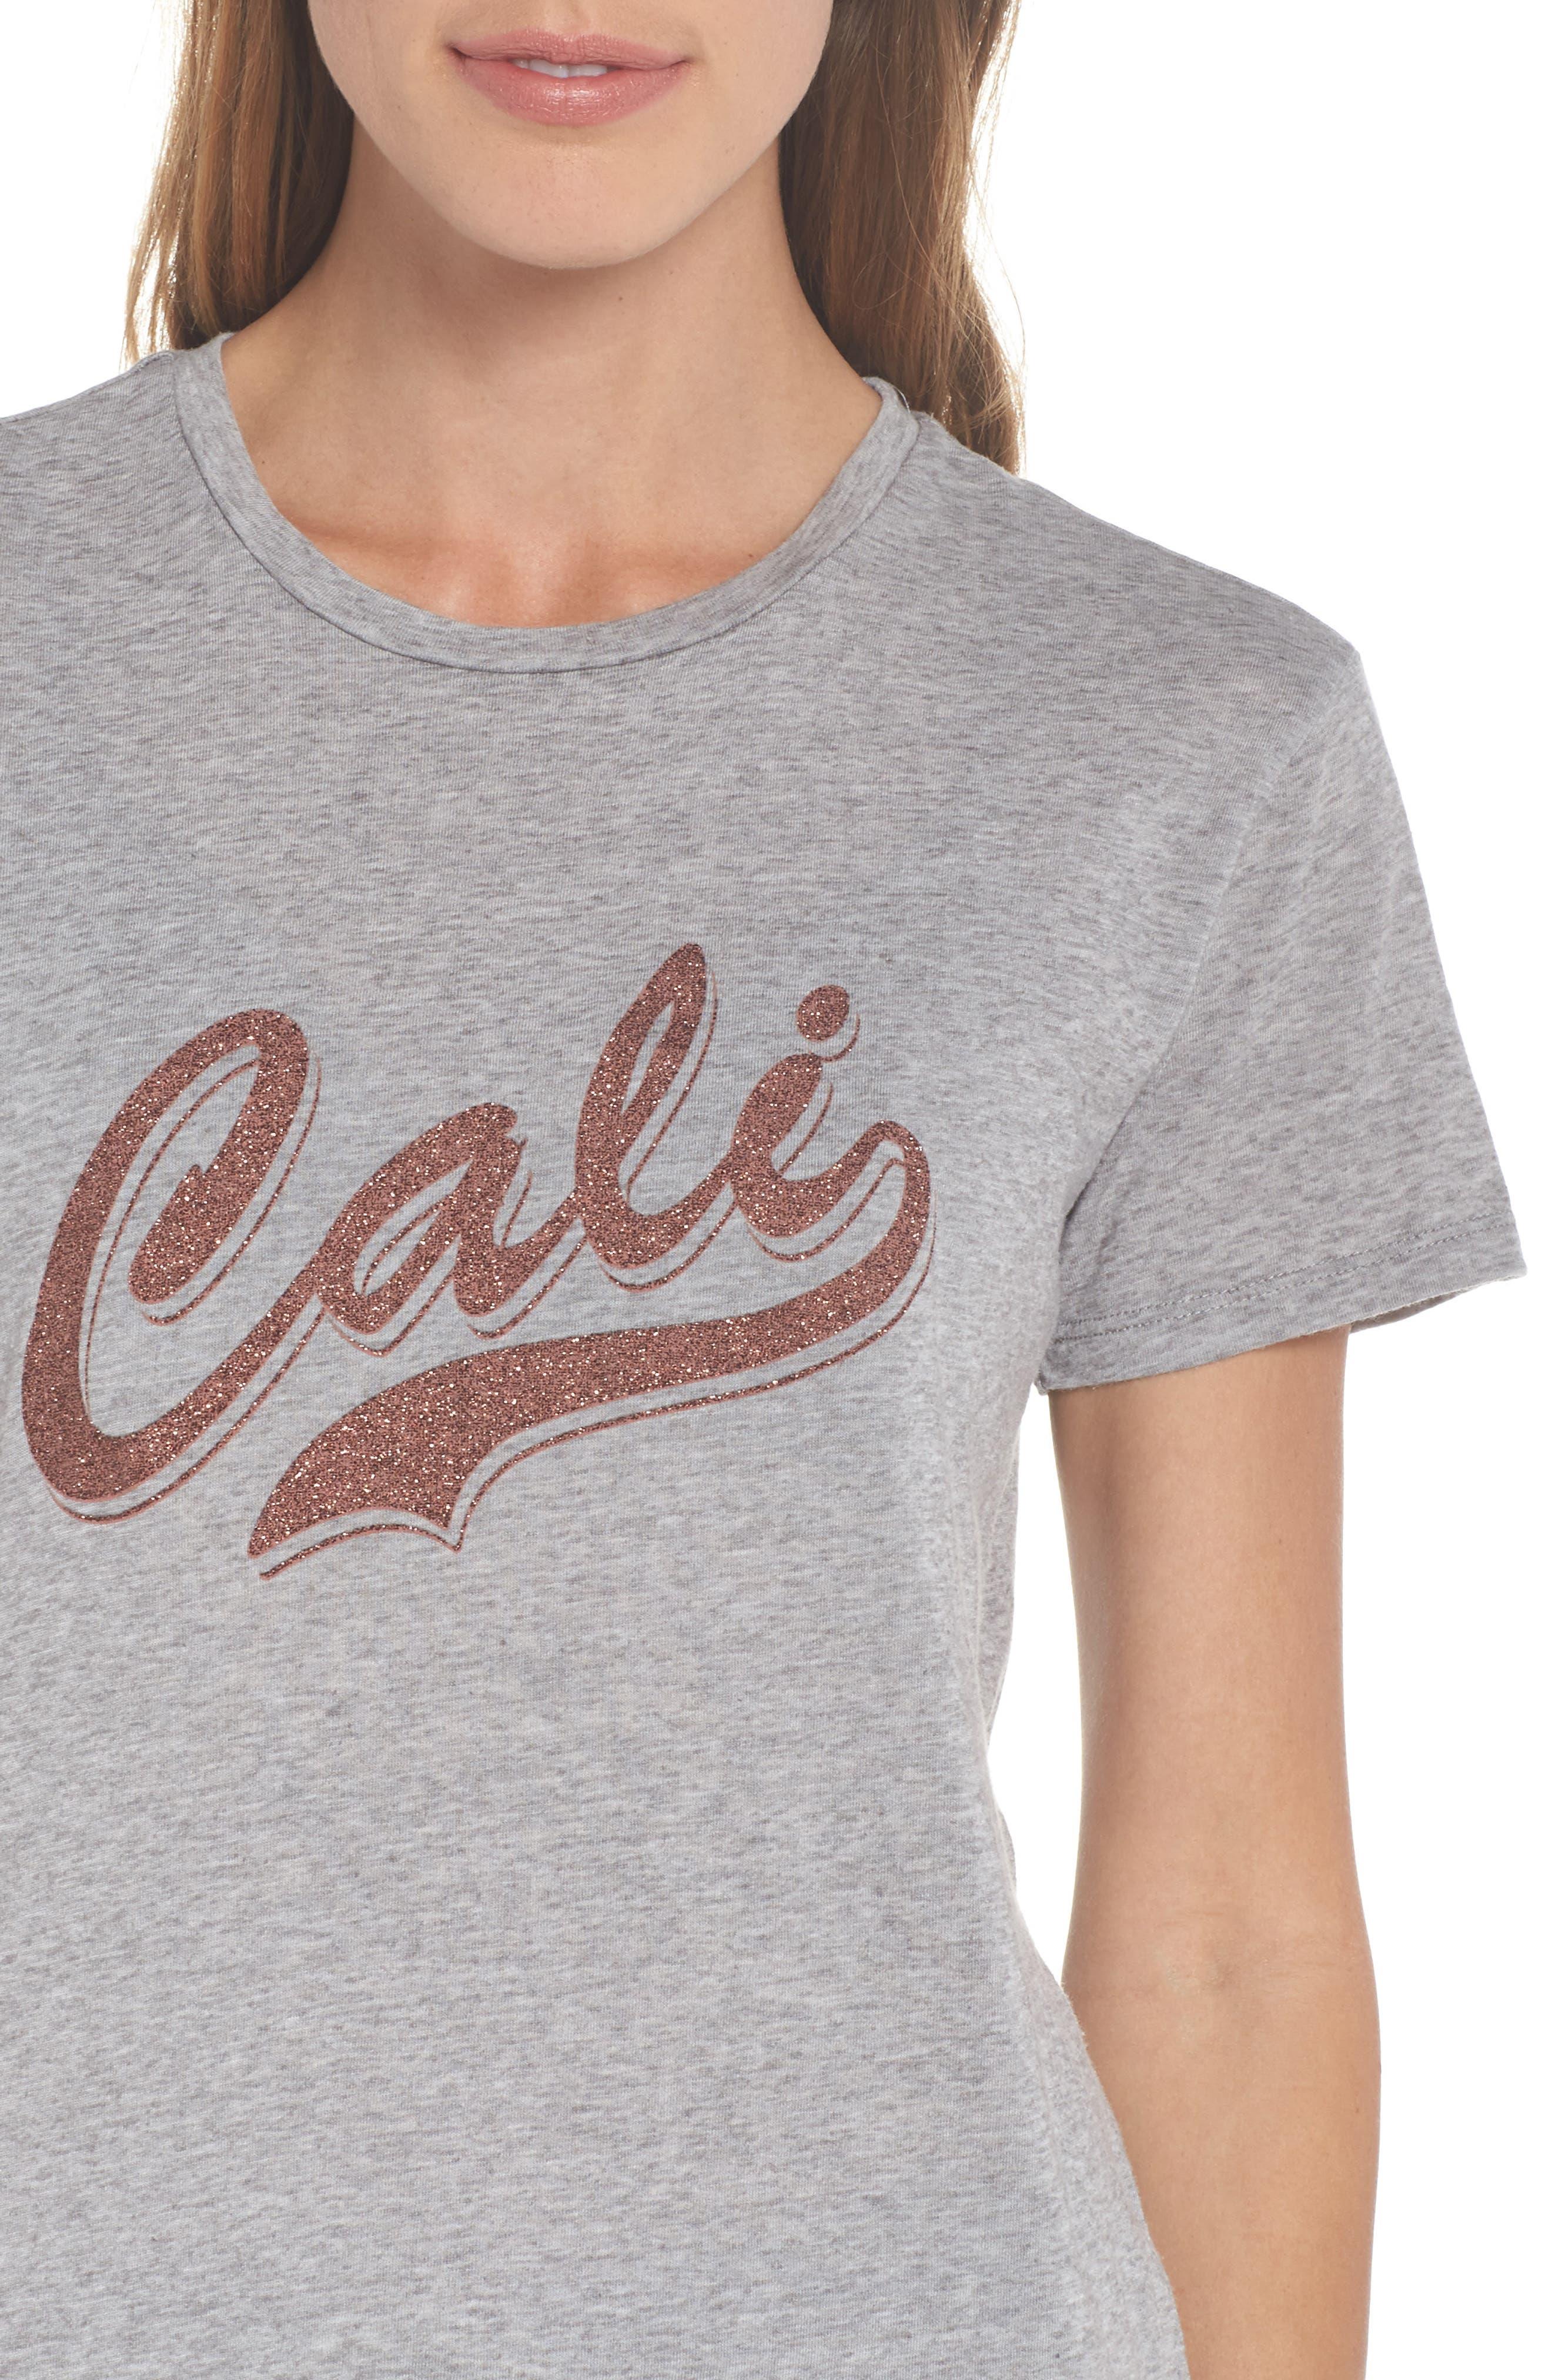 Cali Tee,                             Alternate thumbnail 5, color,                             Heather Grey